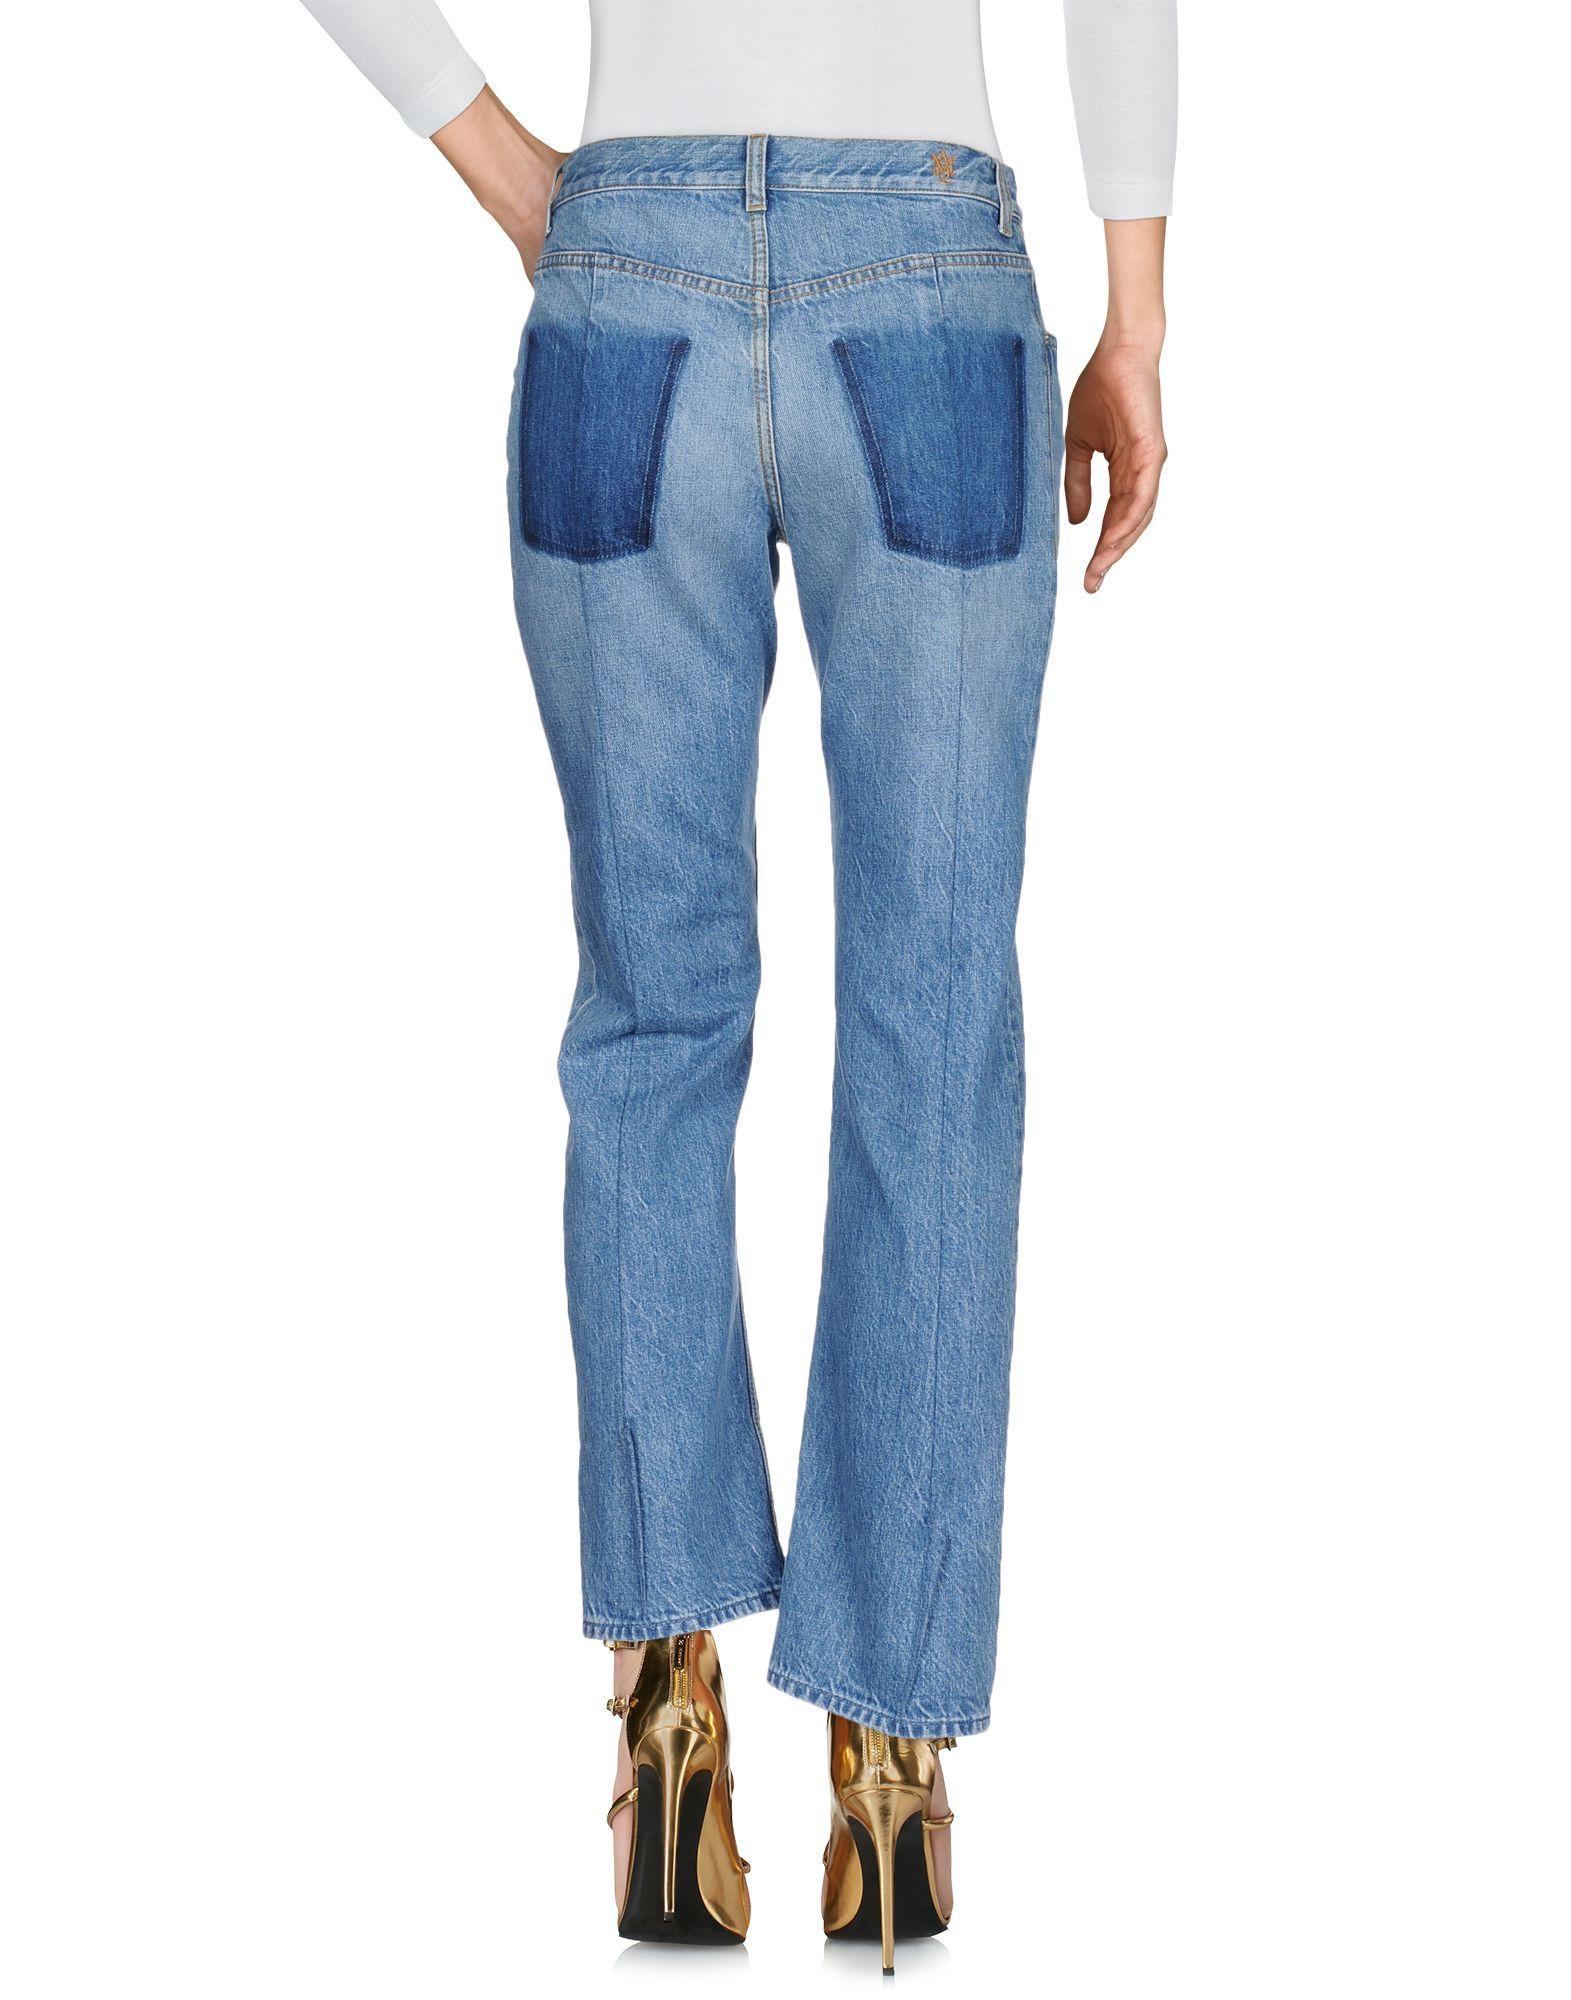 Alexander McQueen Blue Cotton Jeans